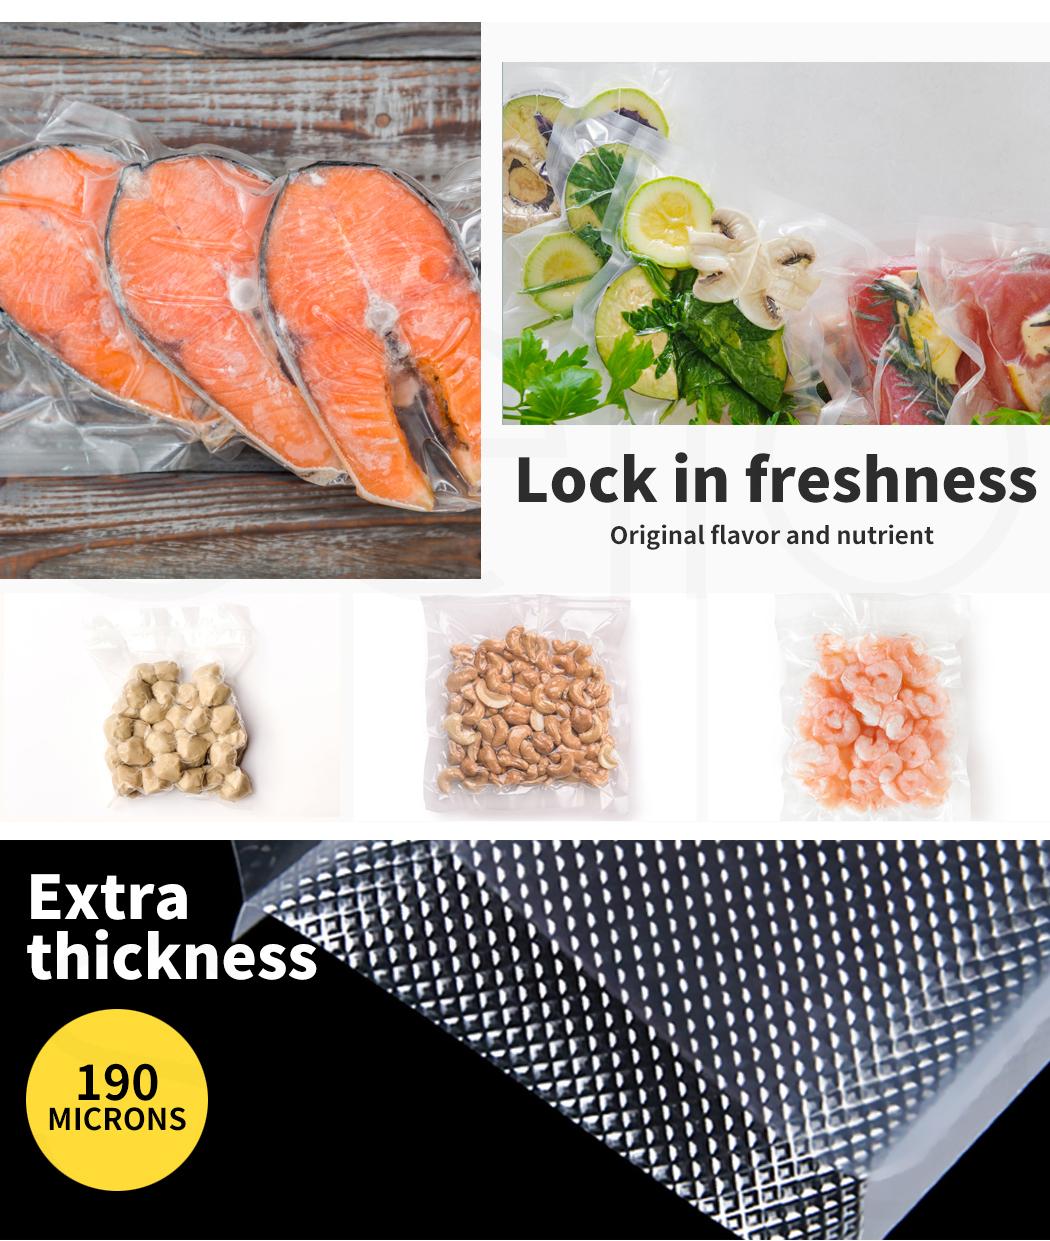 thumbnail 82 - Vacuum Food Sealer Storage Bags Saver Seal Bags Commercial Heat 100/200/500x